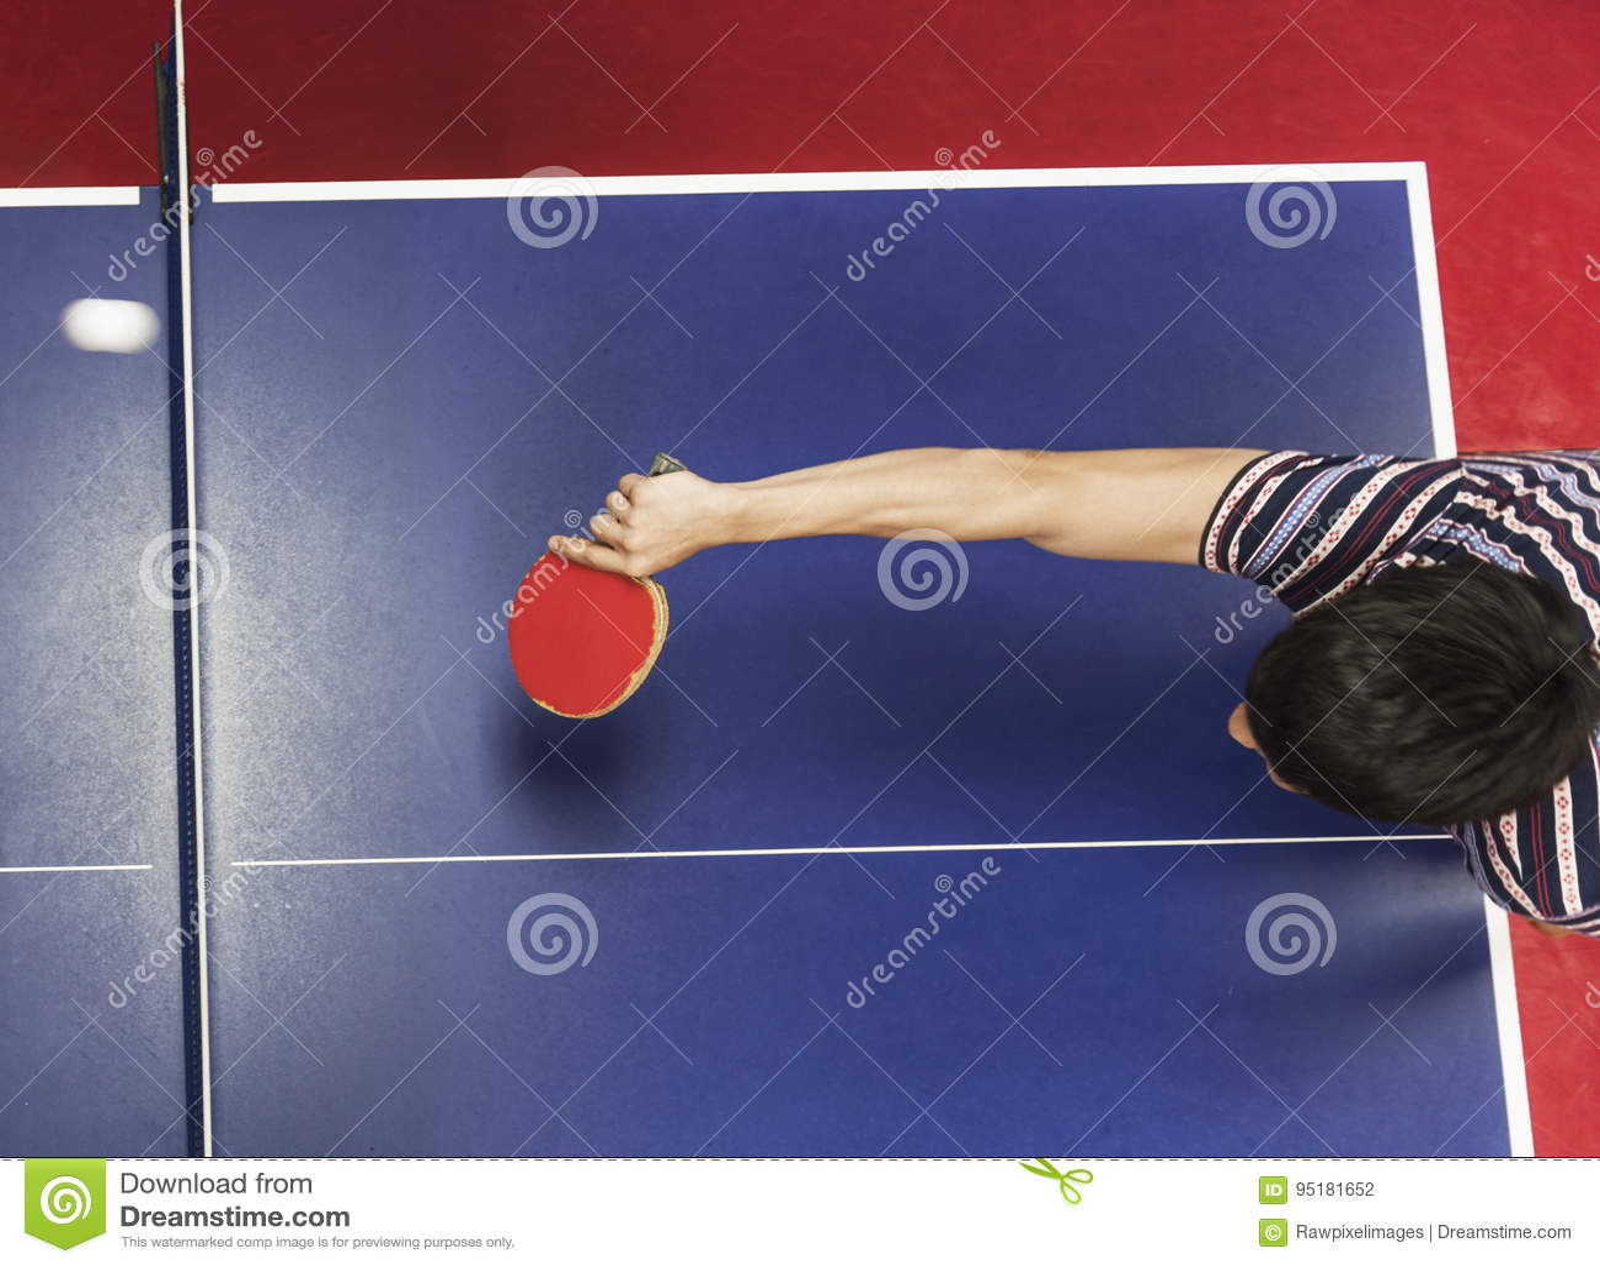 Tênis de mesa Ping-Pong Sport Activity Concept